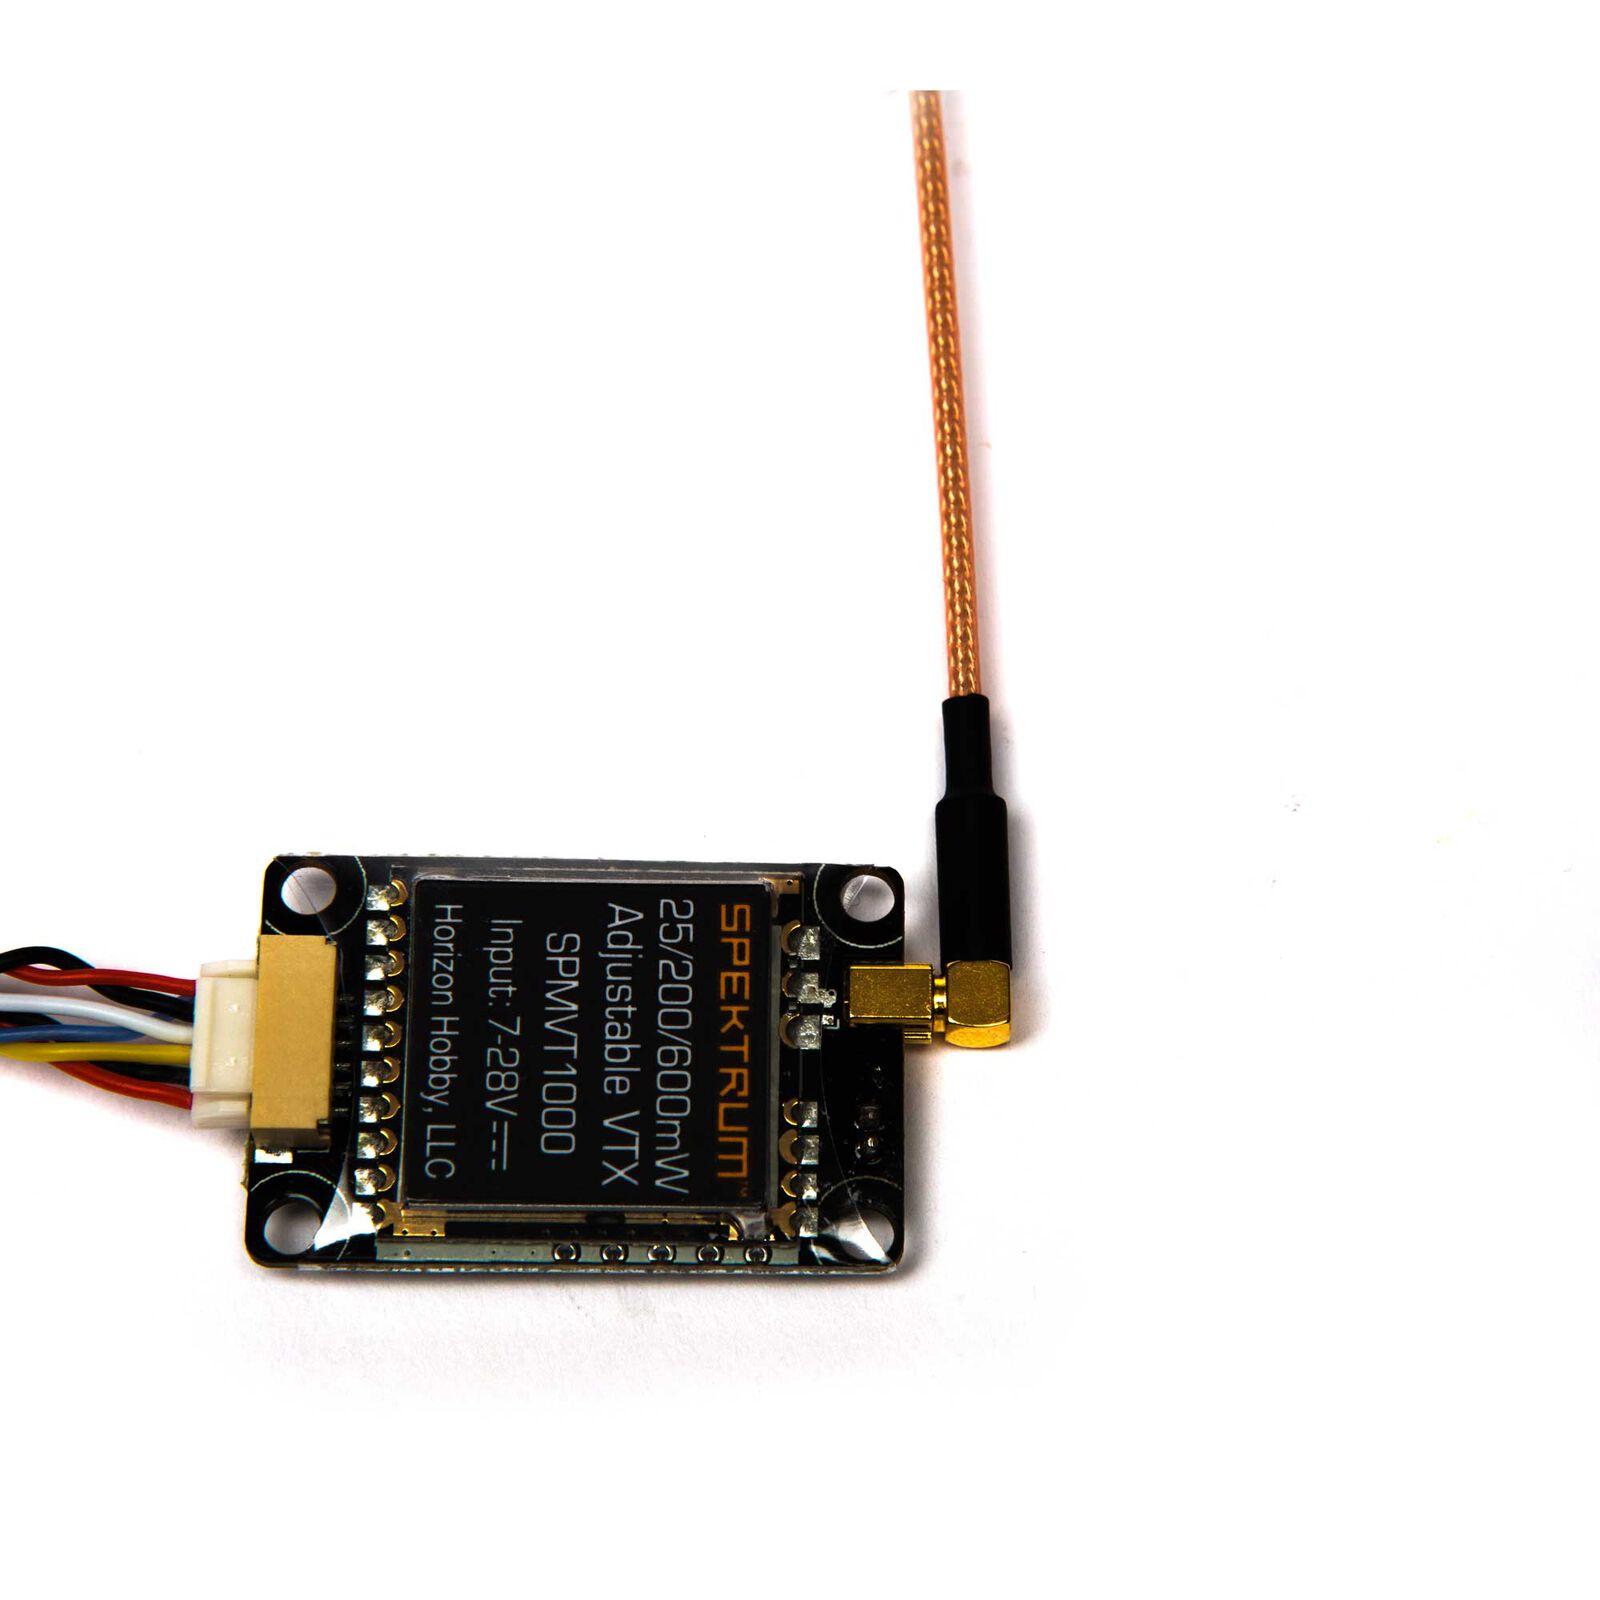 25-200-600mW Adjustable Power Video Transmitter